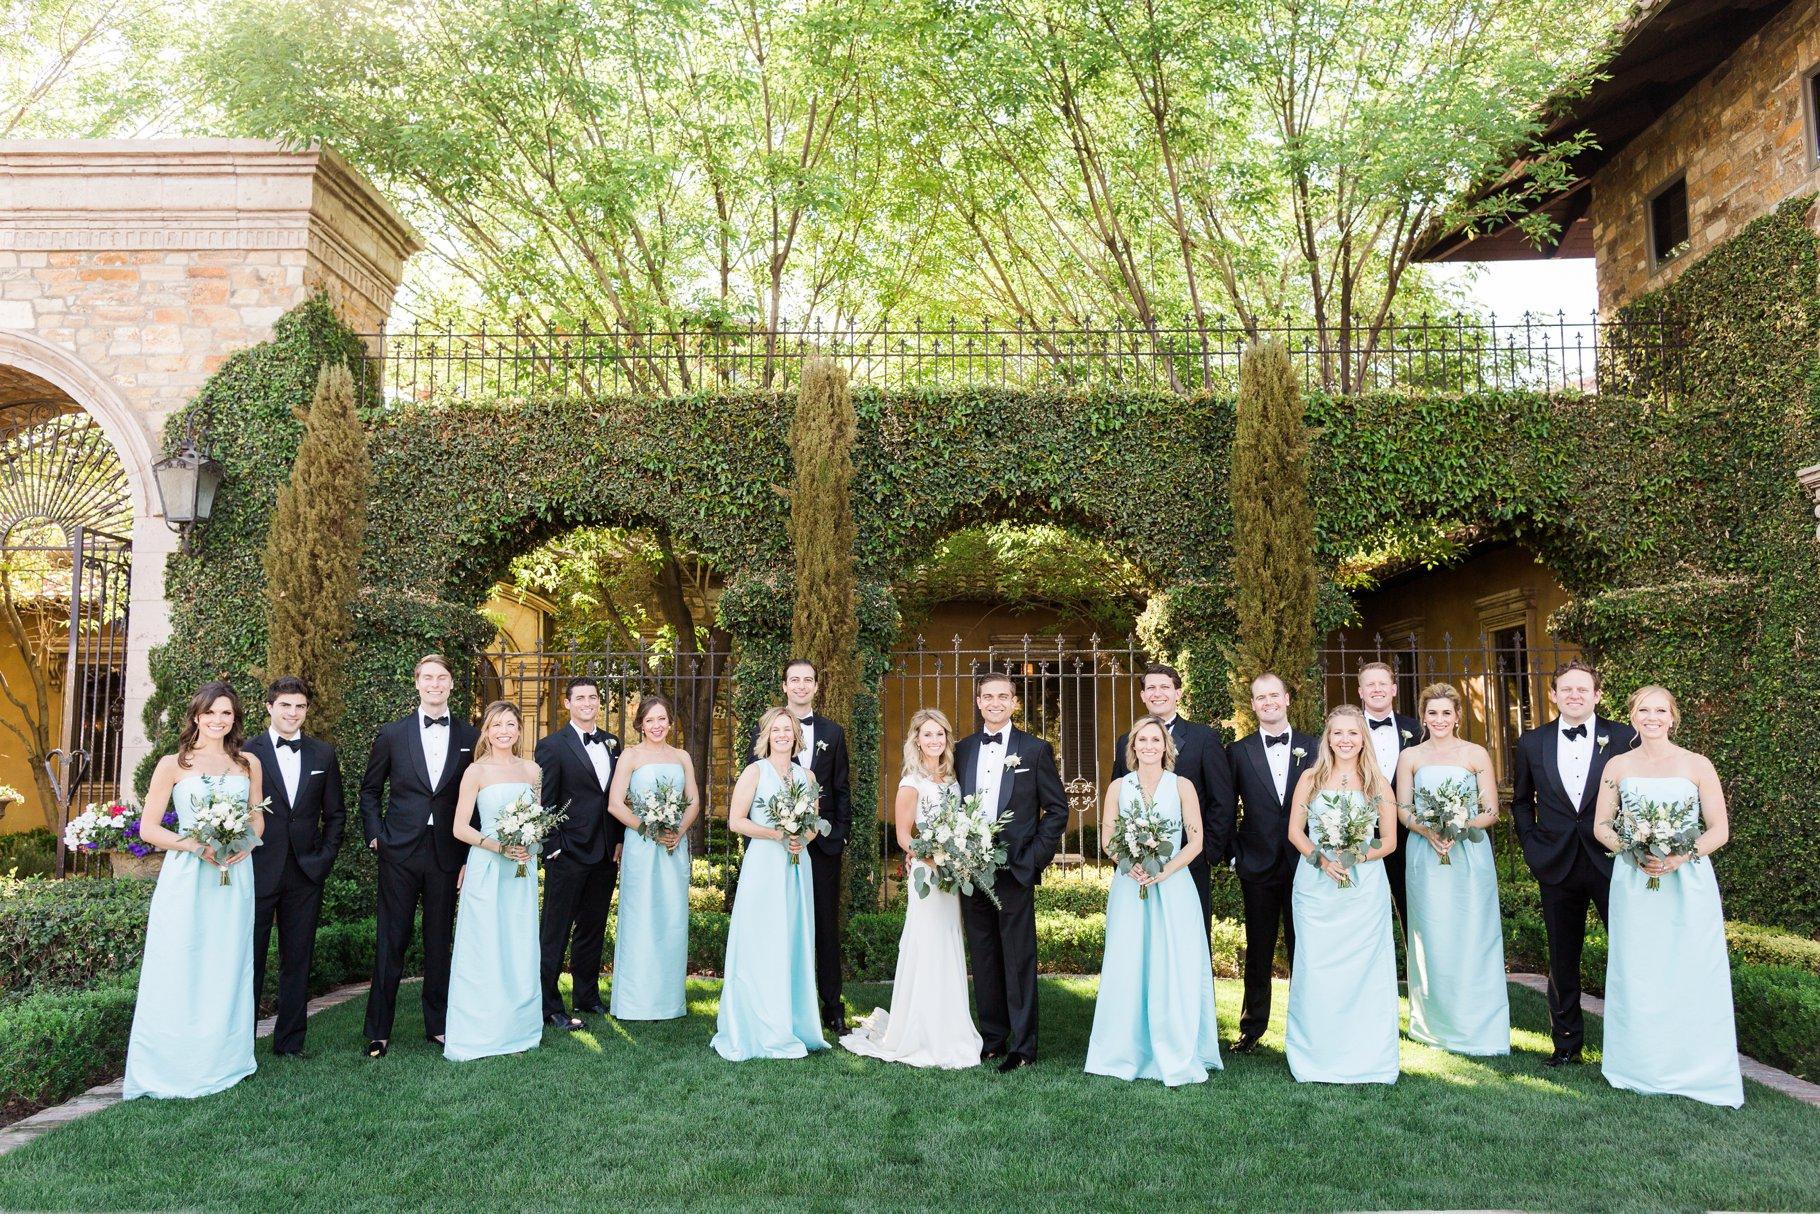 villa siena wedding-041_GRETCHEN WAKEMAN PHOTOGRAPHY.jpg